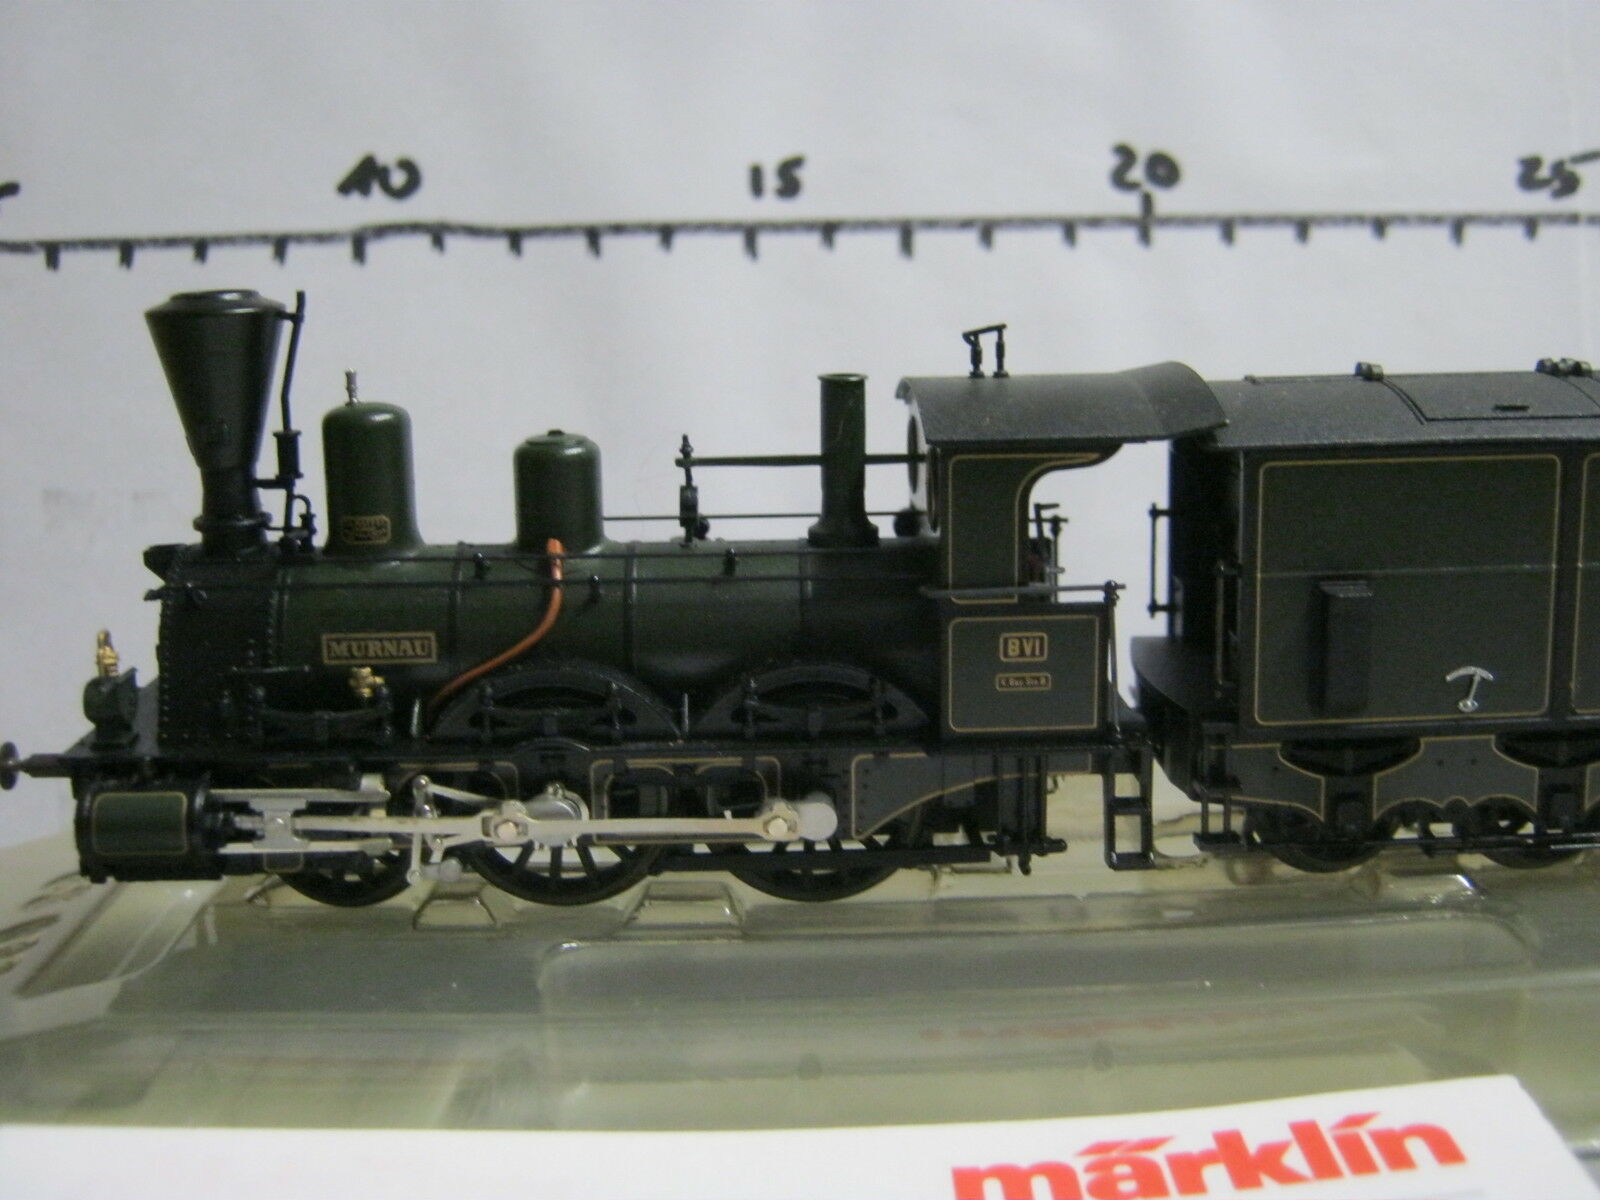 Digital   HO 3797 locomotiva a vapore BR B vi Murnau kbaysts  rg/re/012-155s7/2